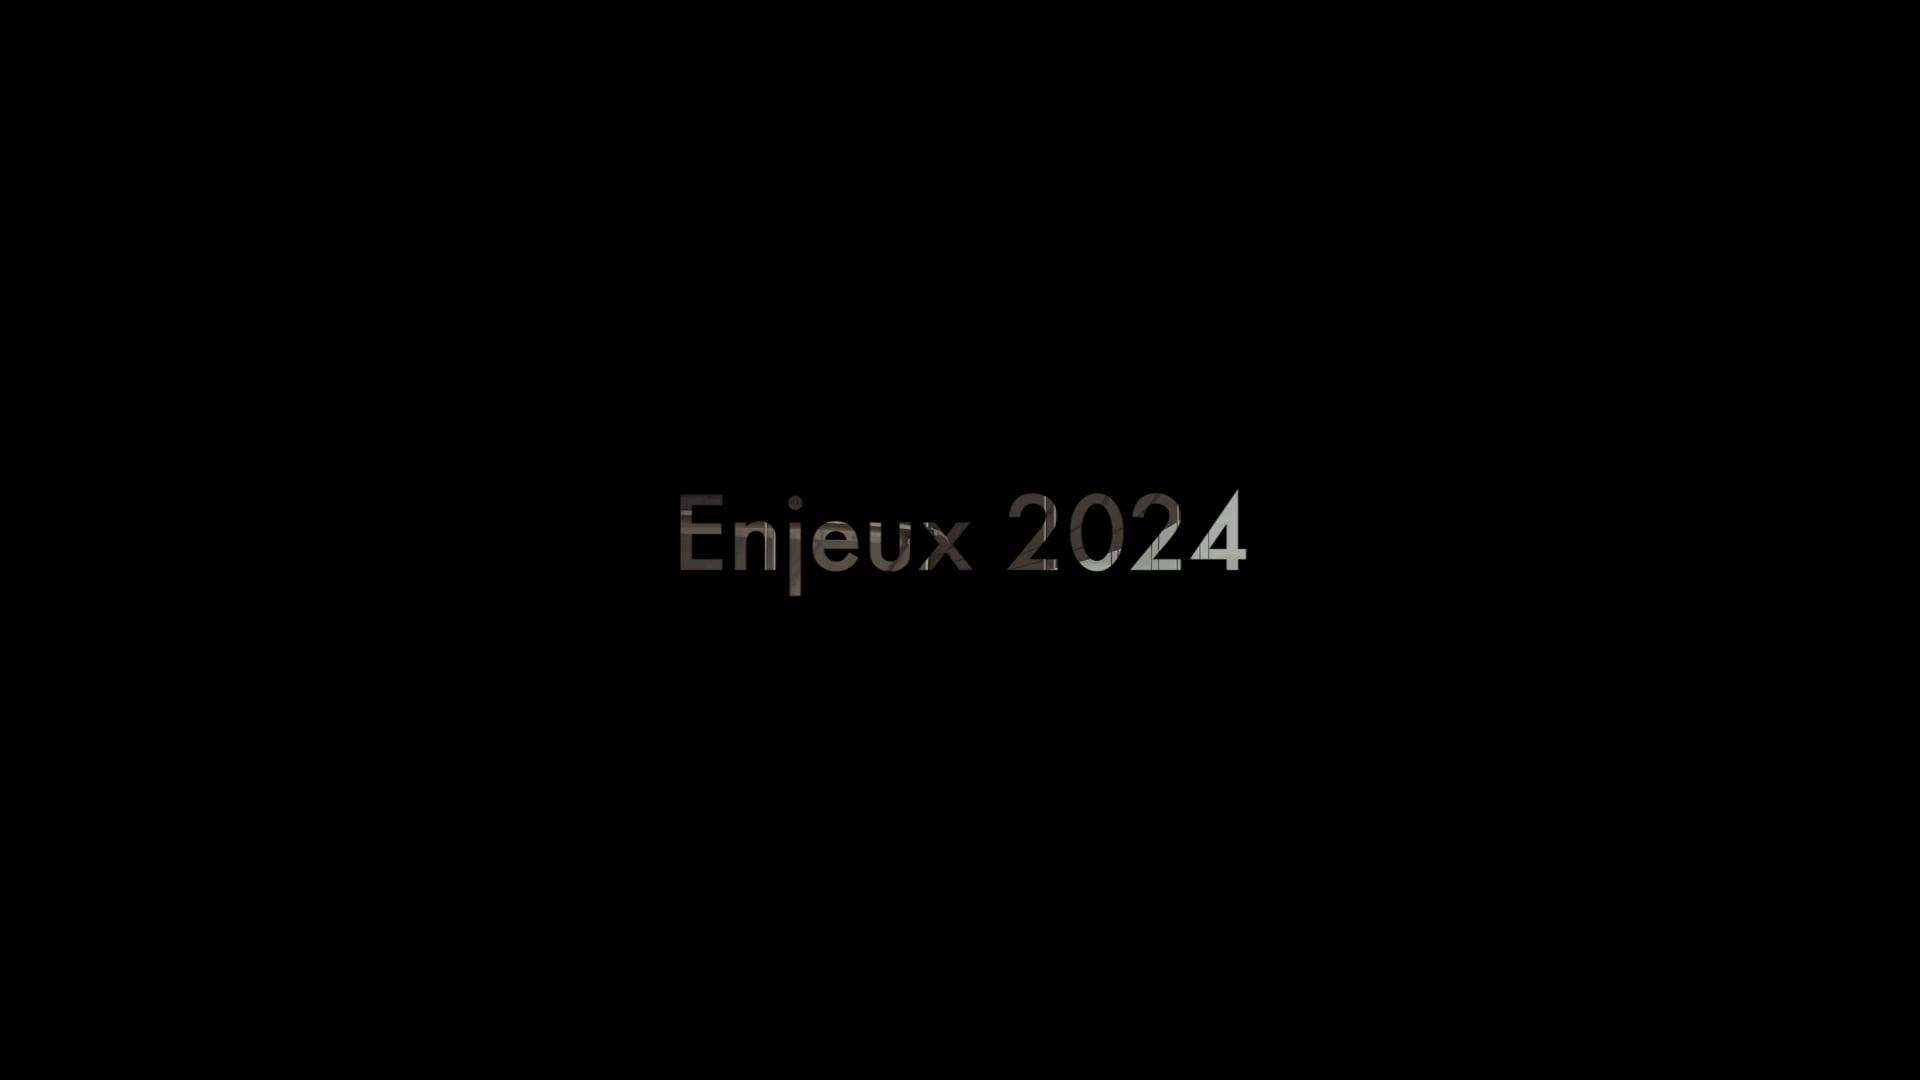 Enjeux 2024